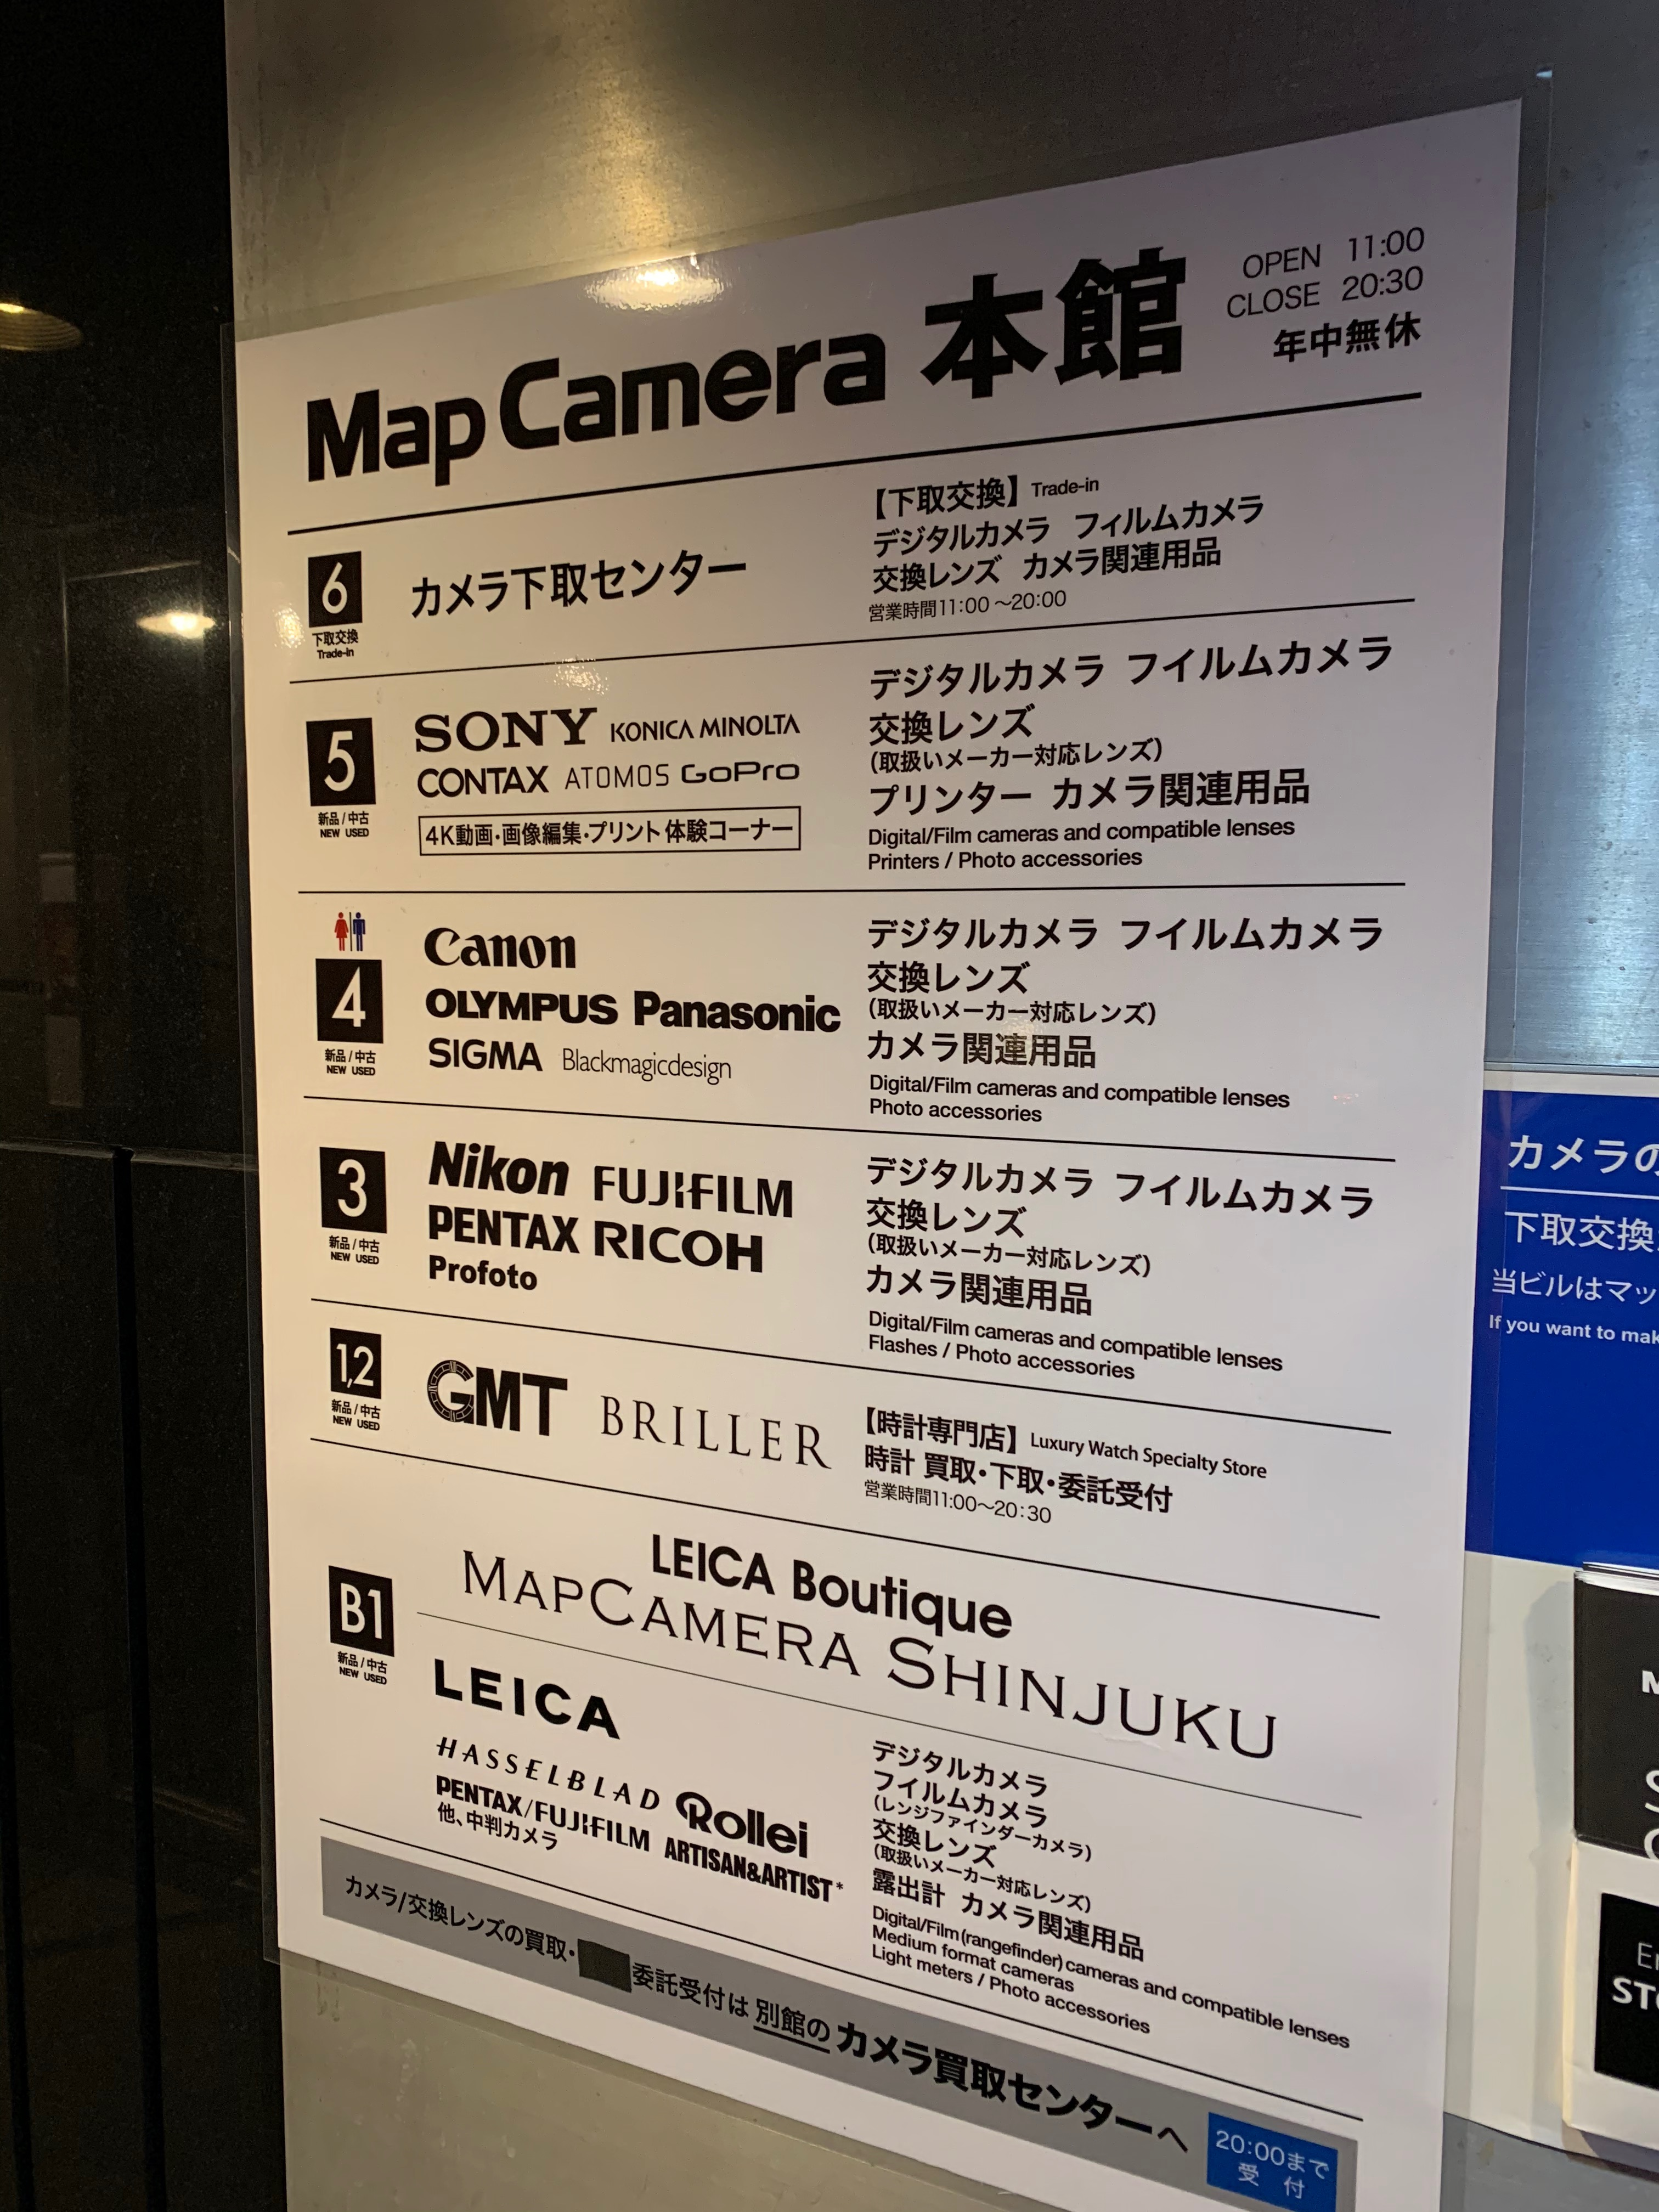 Map Camera